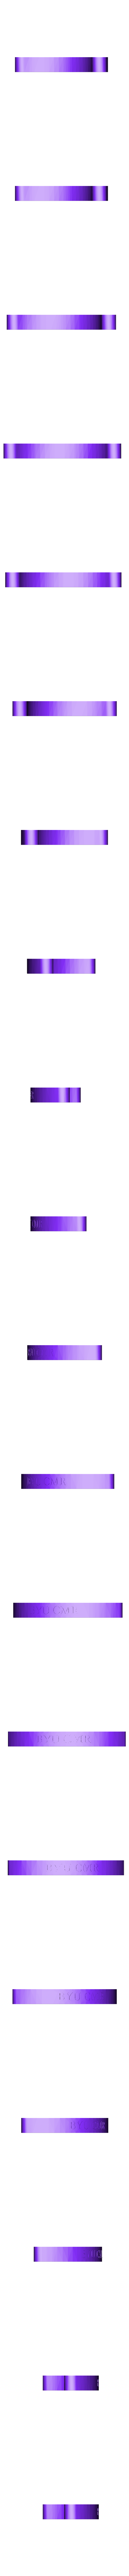 9holesBig.STL Download free STL file CurvedLinks: Large size circular links (LEGO Compatible) • 3D printing template, byucmr